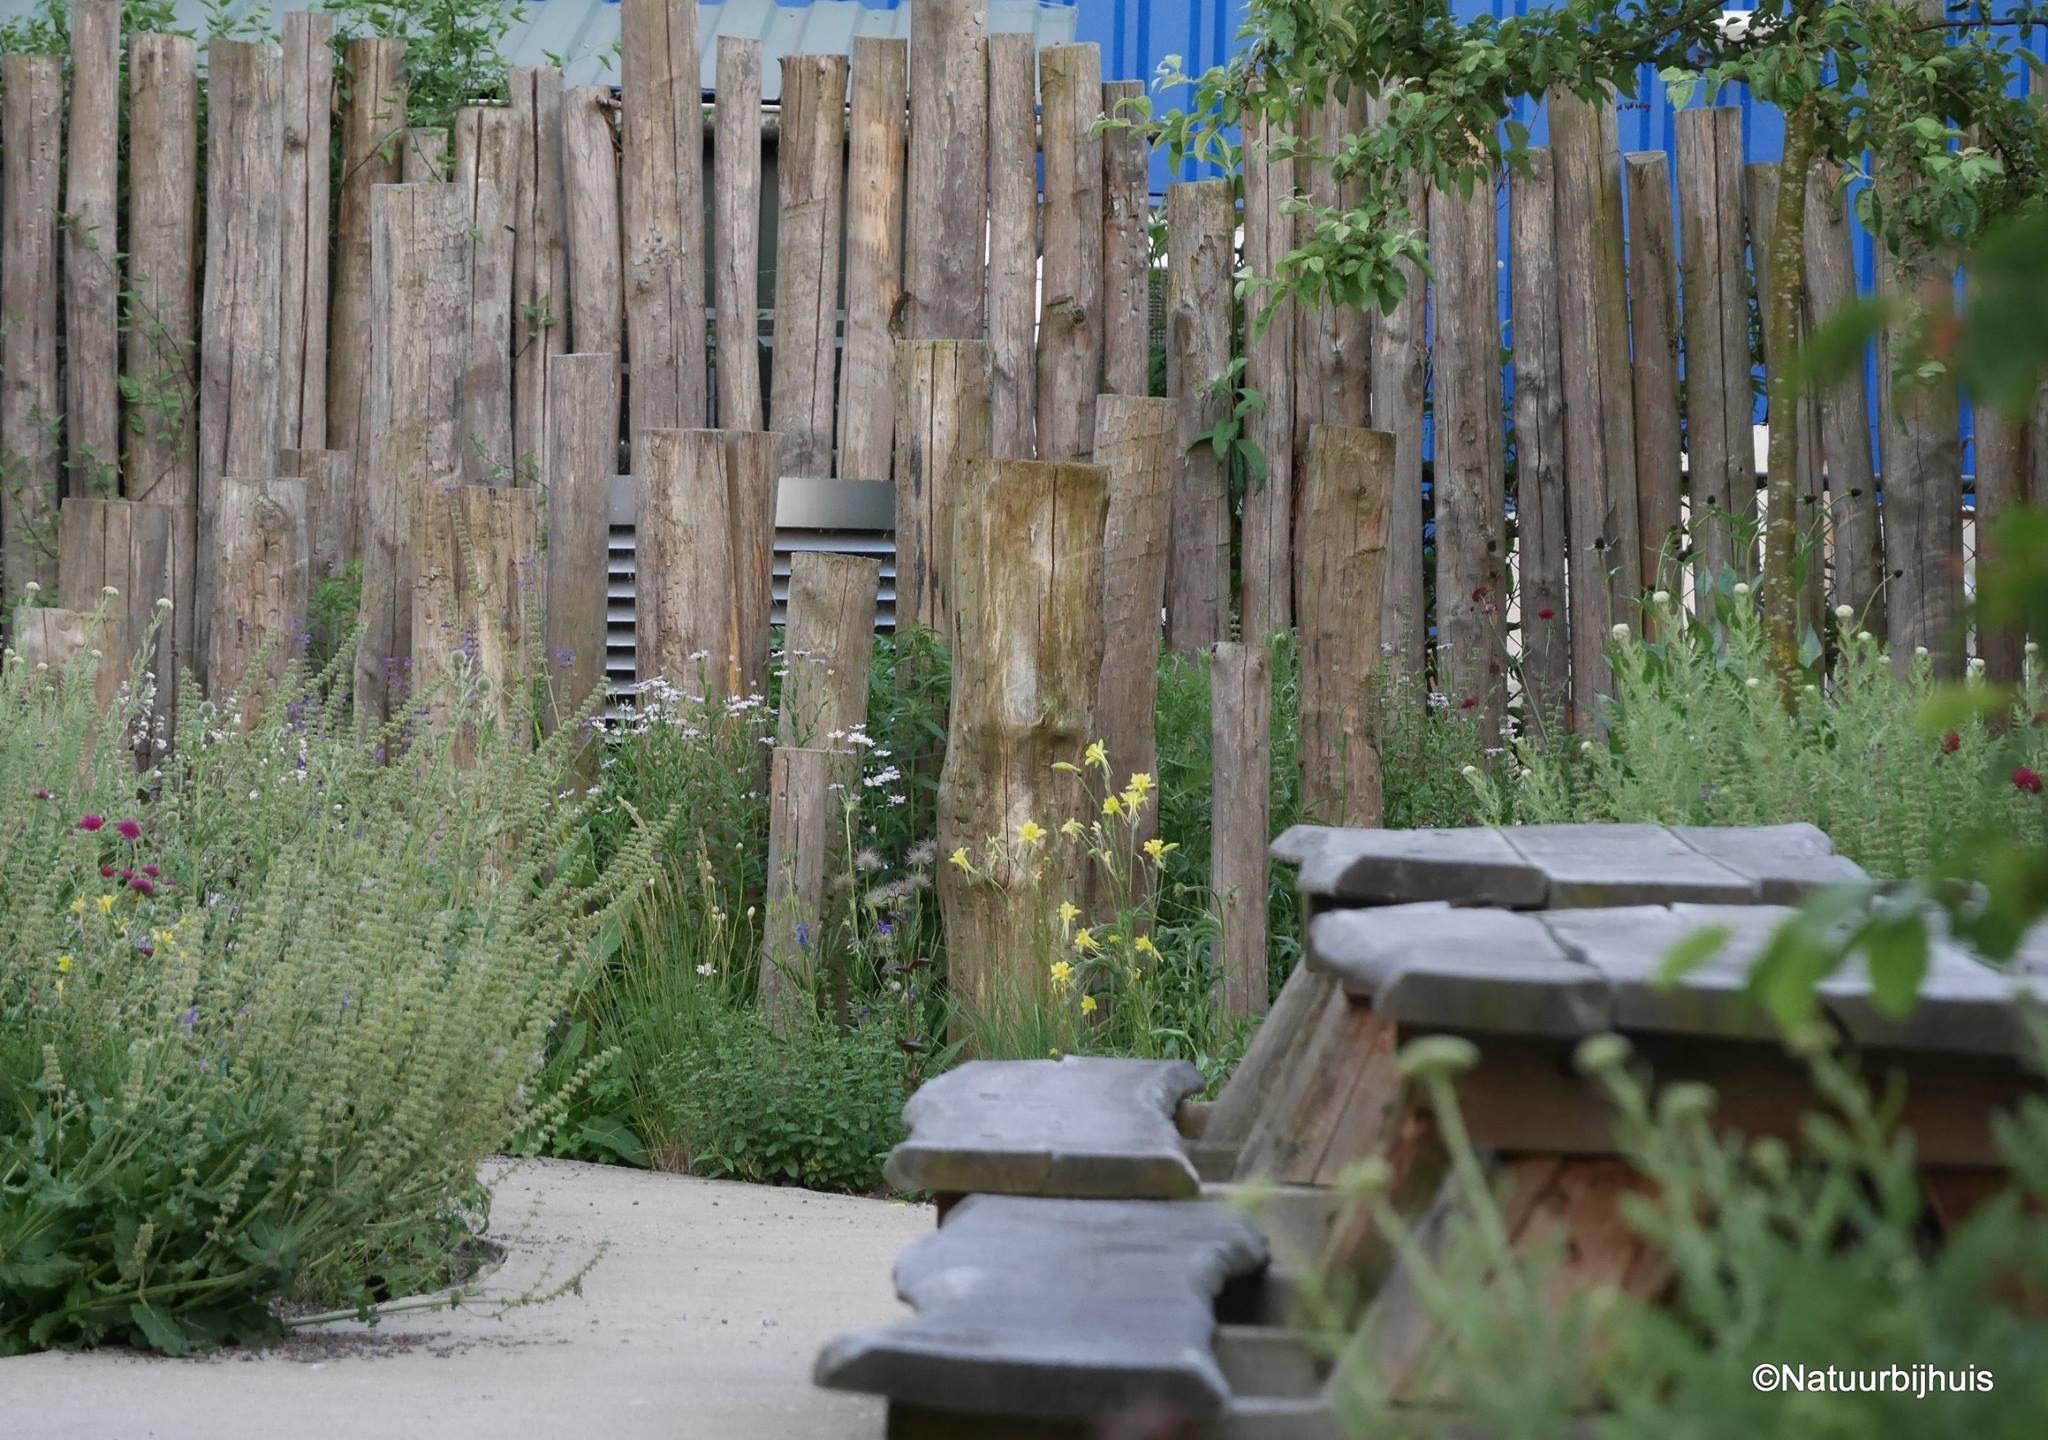 Pin Van Carina Schalkwijk Op Jardin Tuin Palen Inheemse Tuin Tuin Afscheiding